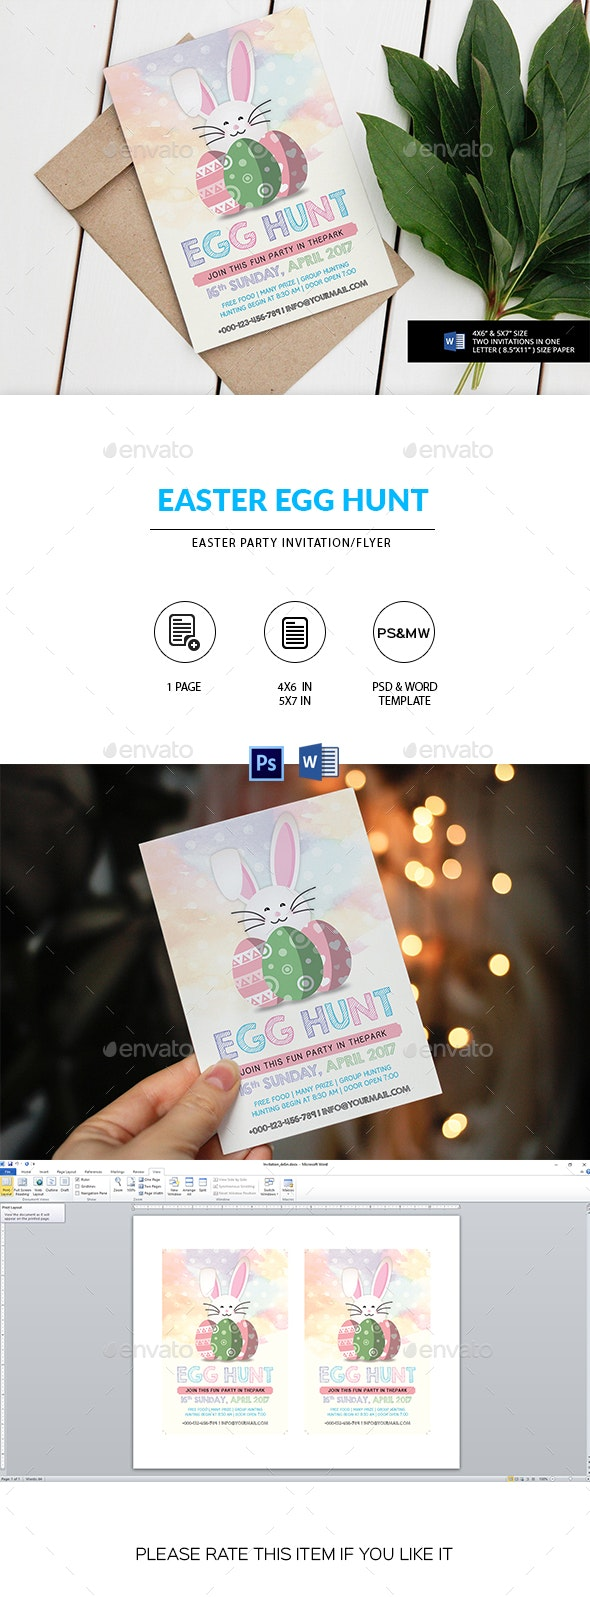 Easter Egg Hunt Party Invitation/Flyer - Holidays Events